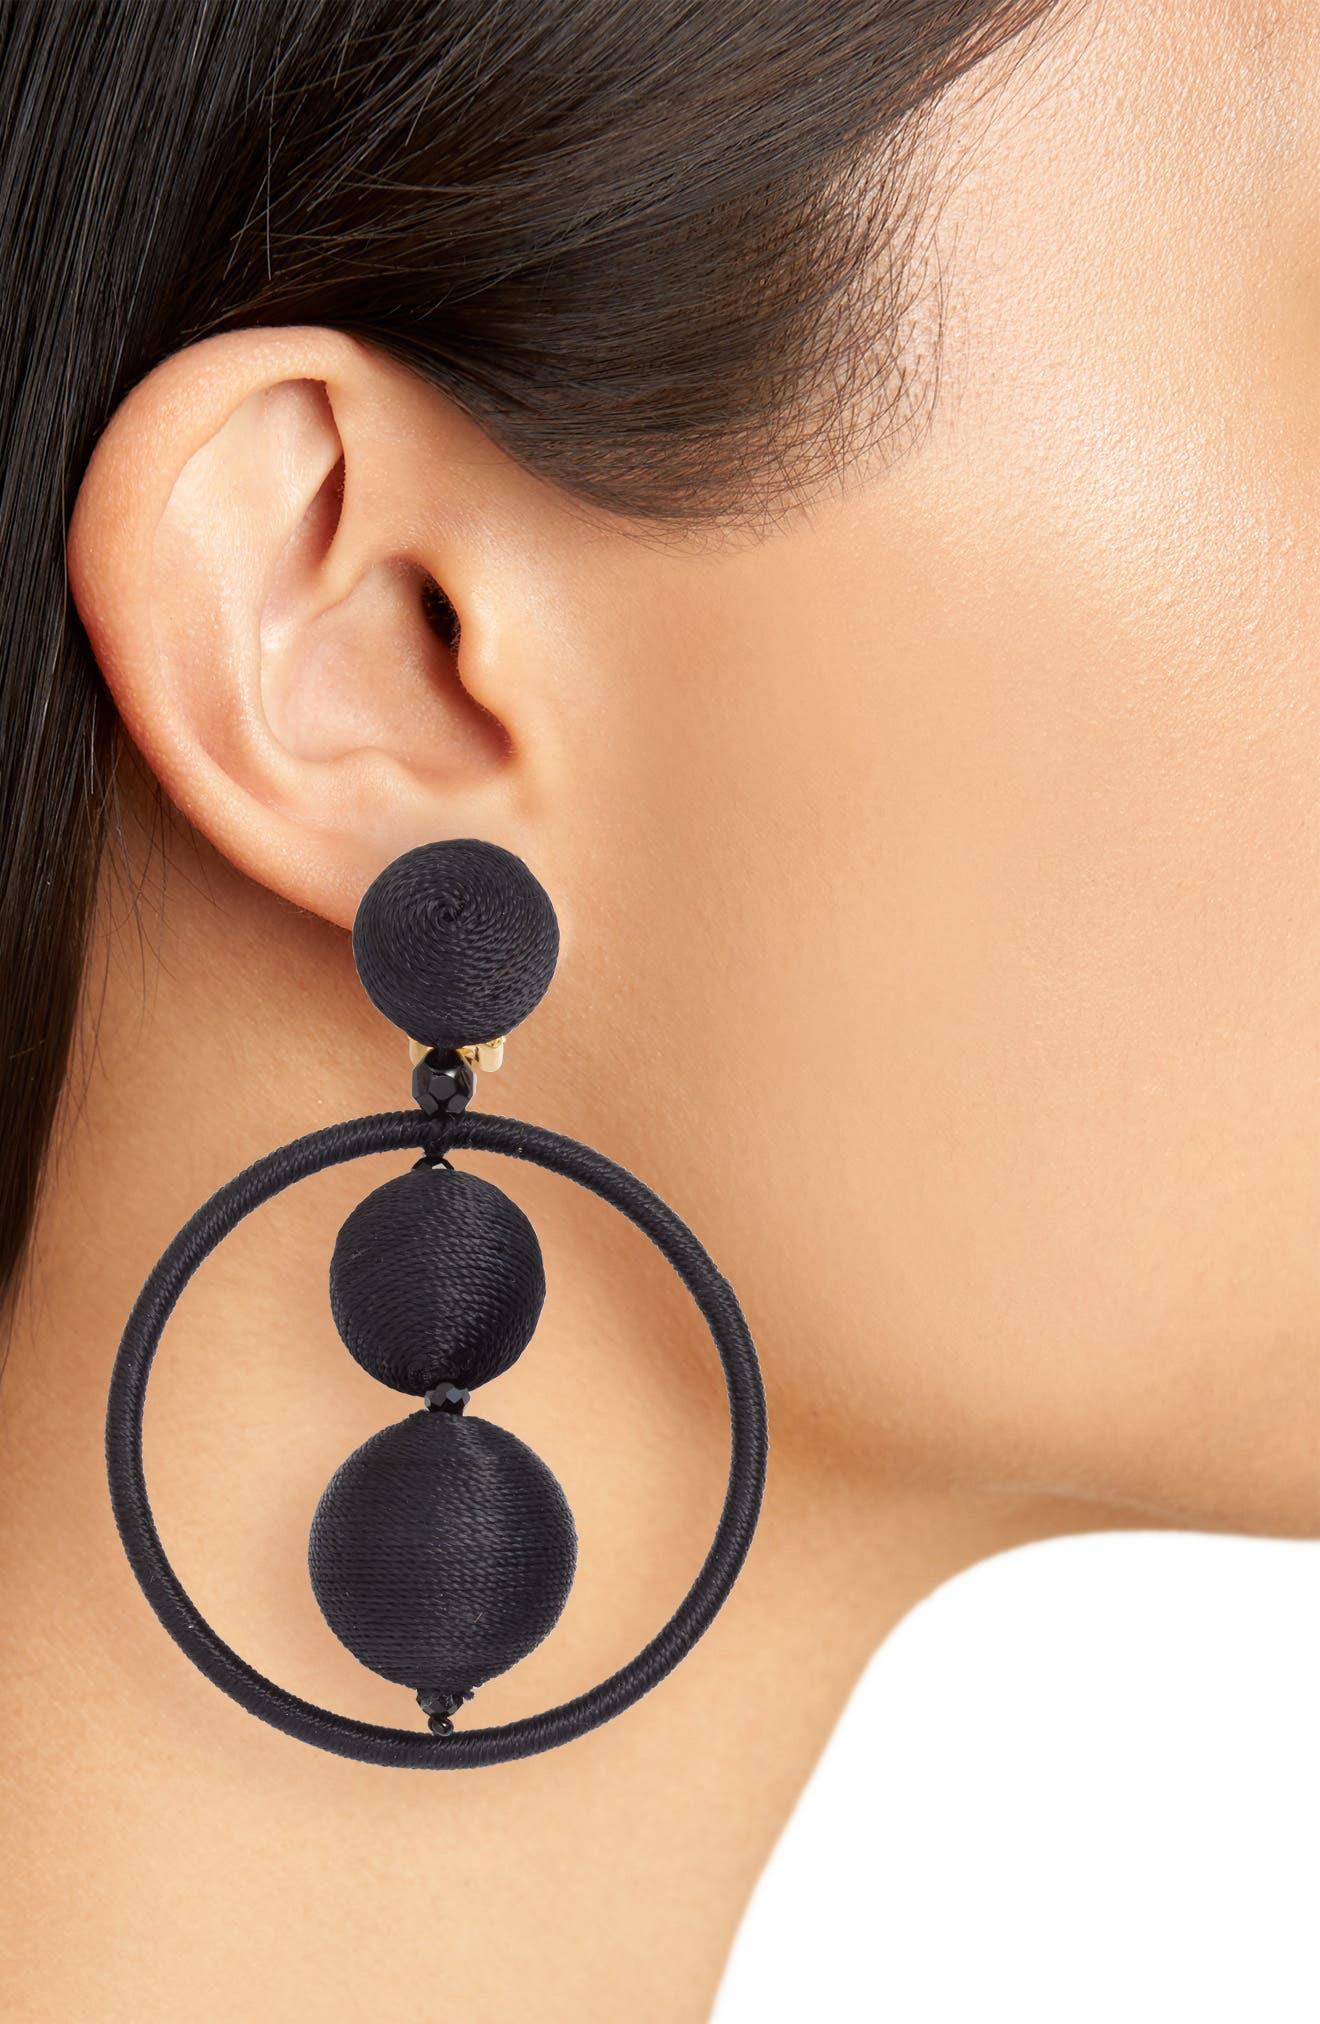 OSCAR DE LA RENTA,                             Double Beaded Ball Hoop Clip-On Earrings,                             Alternate thumbnail 2, color,                             001